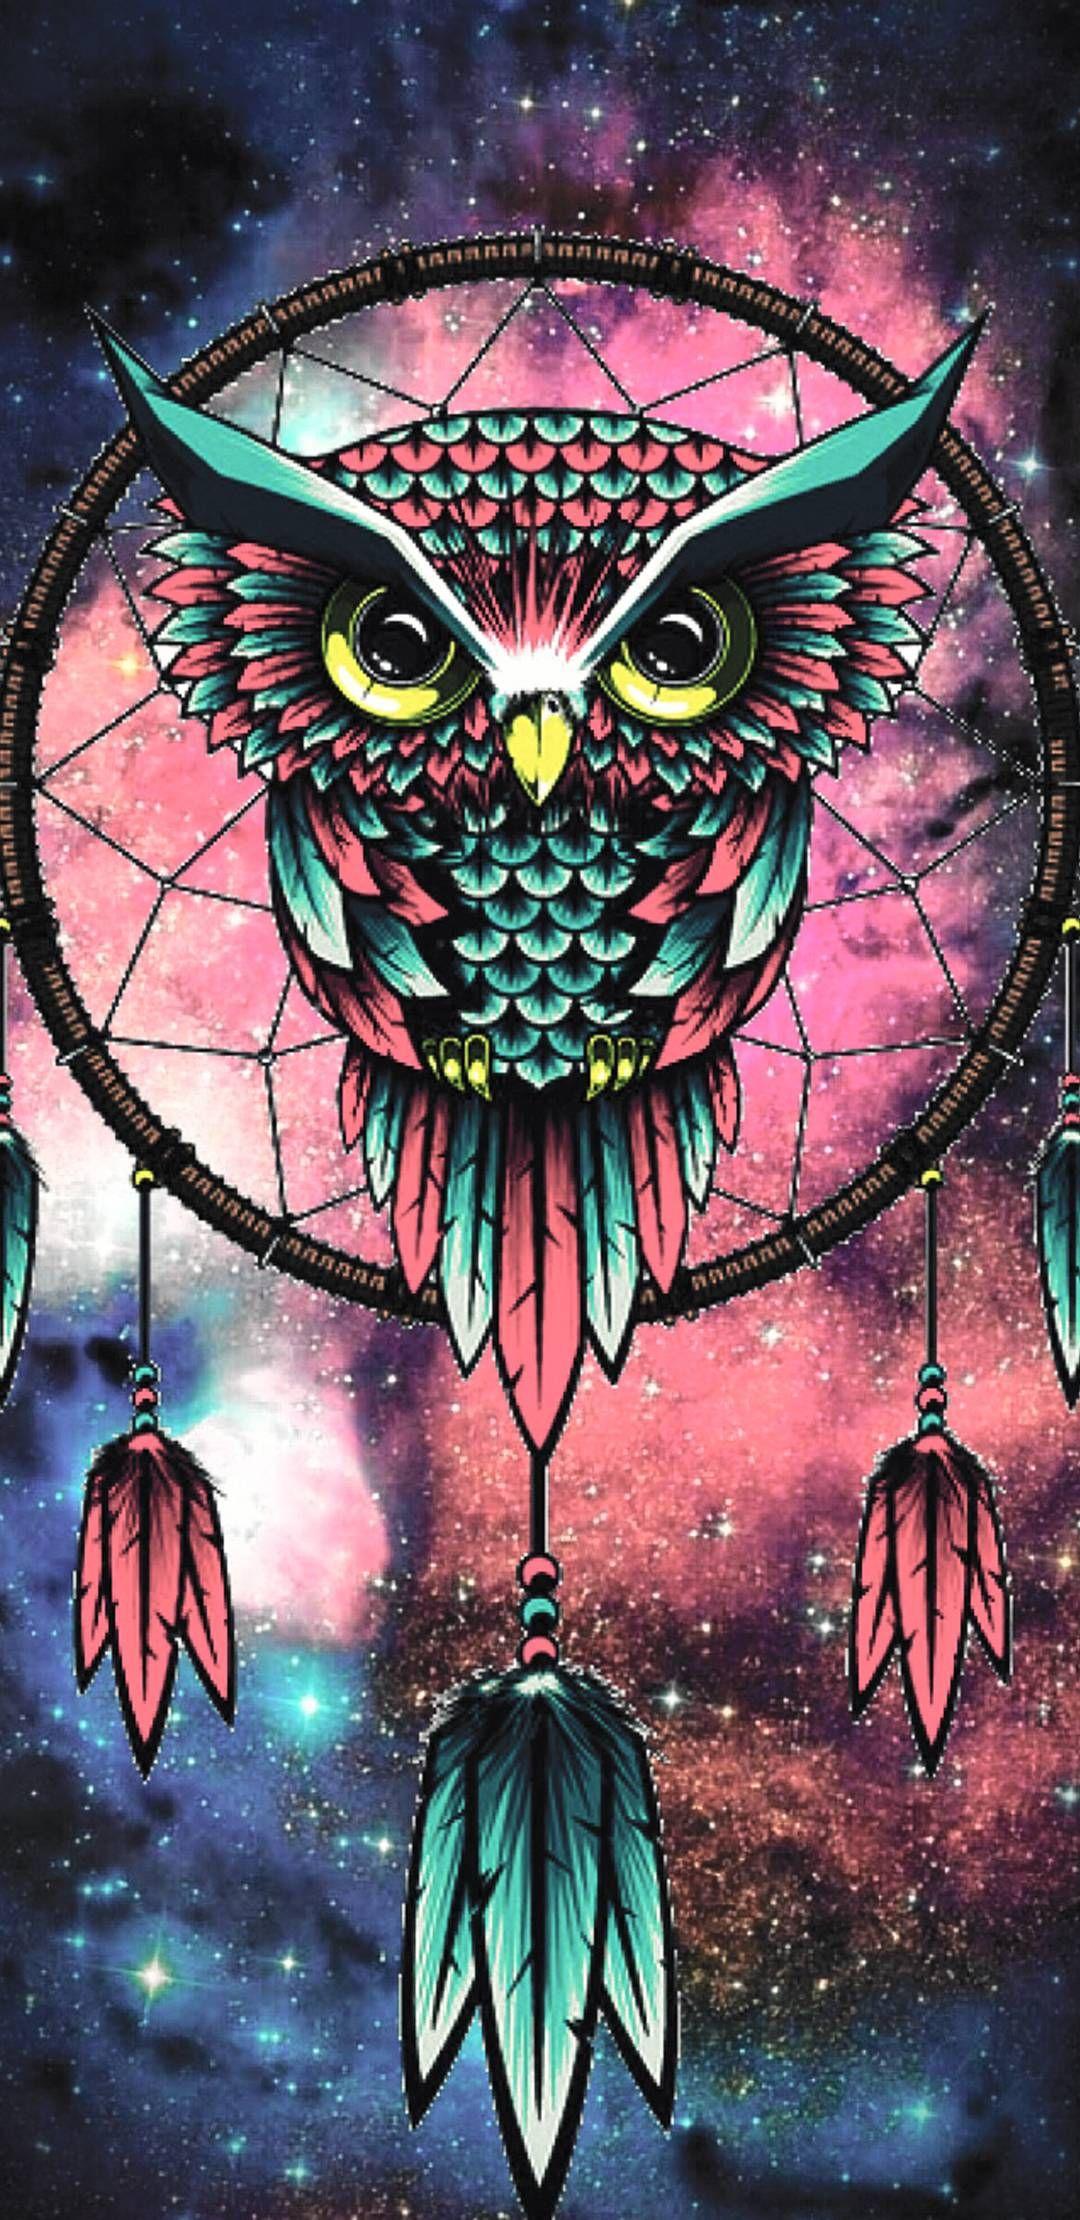 Pin By Andrea Denes On Owls Owl Wallpaper Cute Owls Wallpaper Owl Artwork